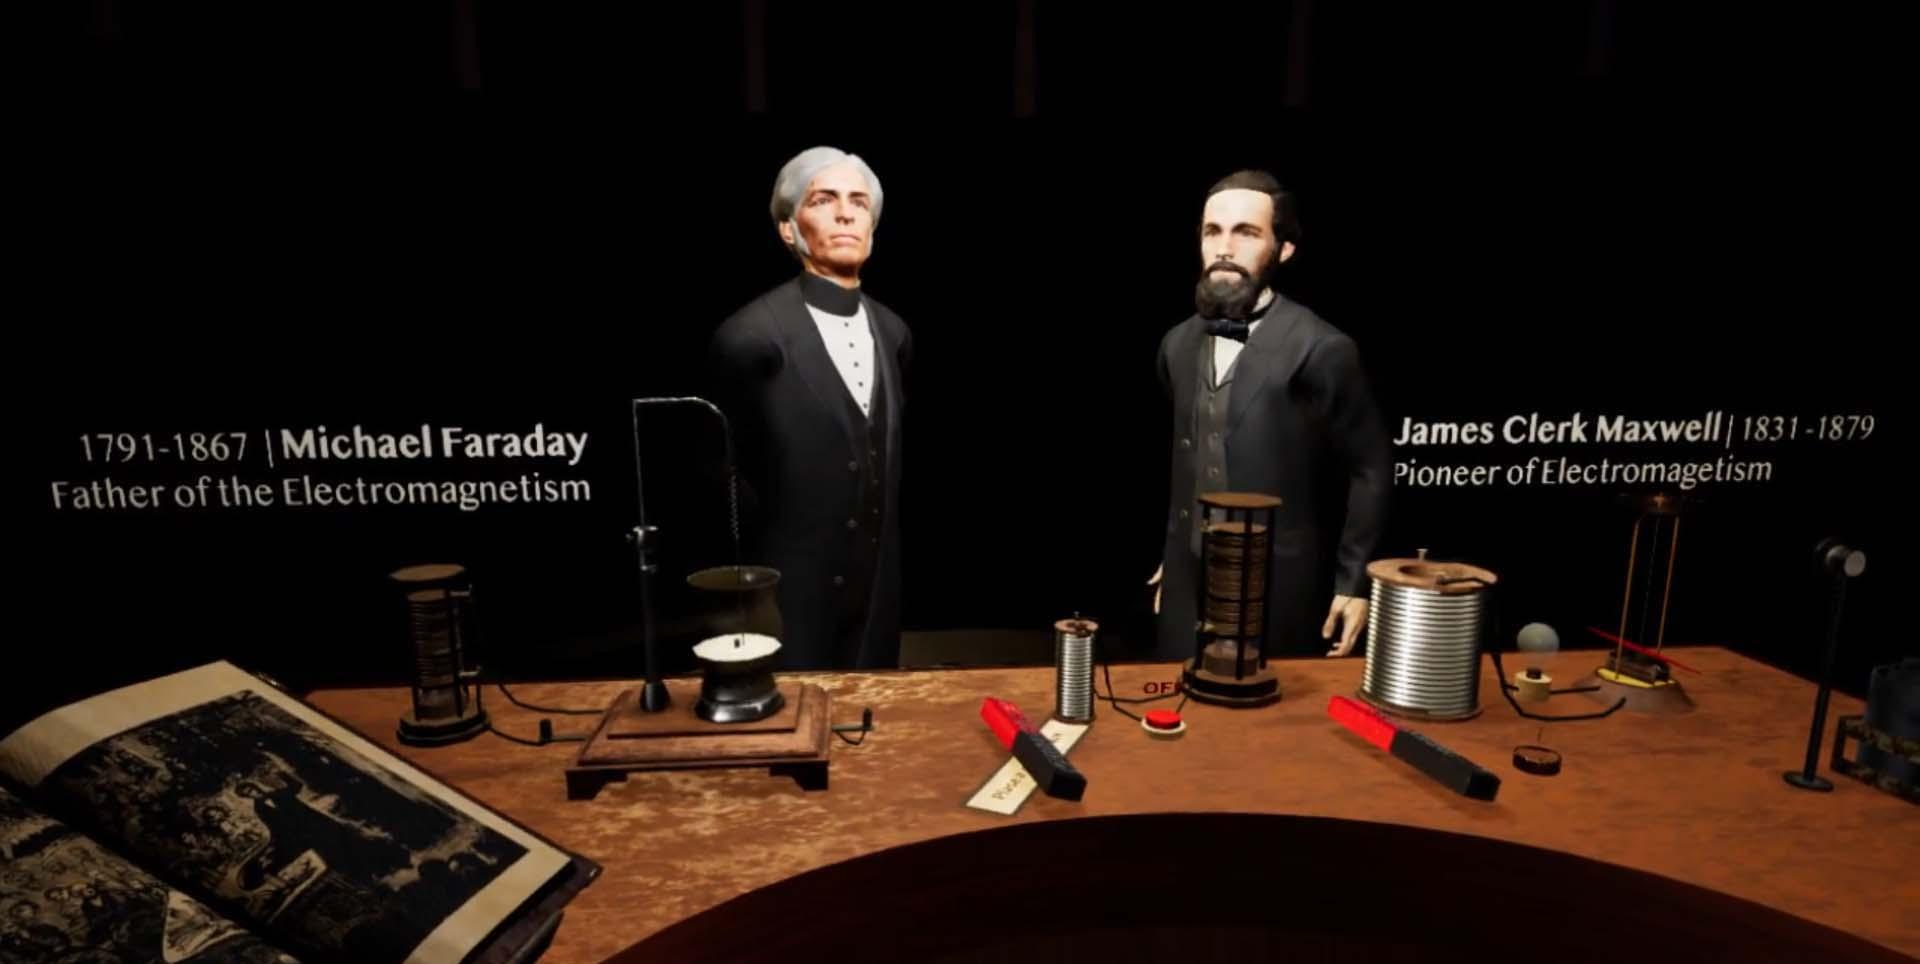 Faraday's Magnets